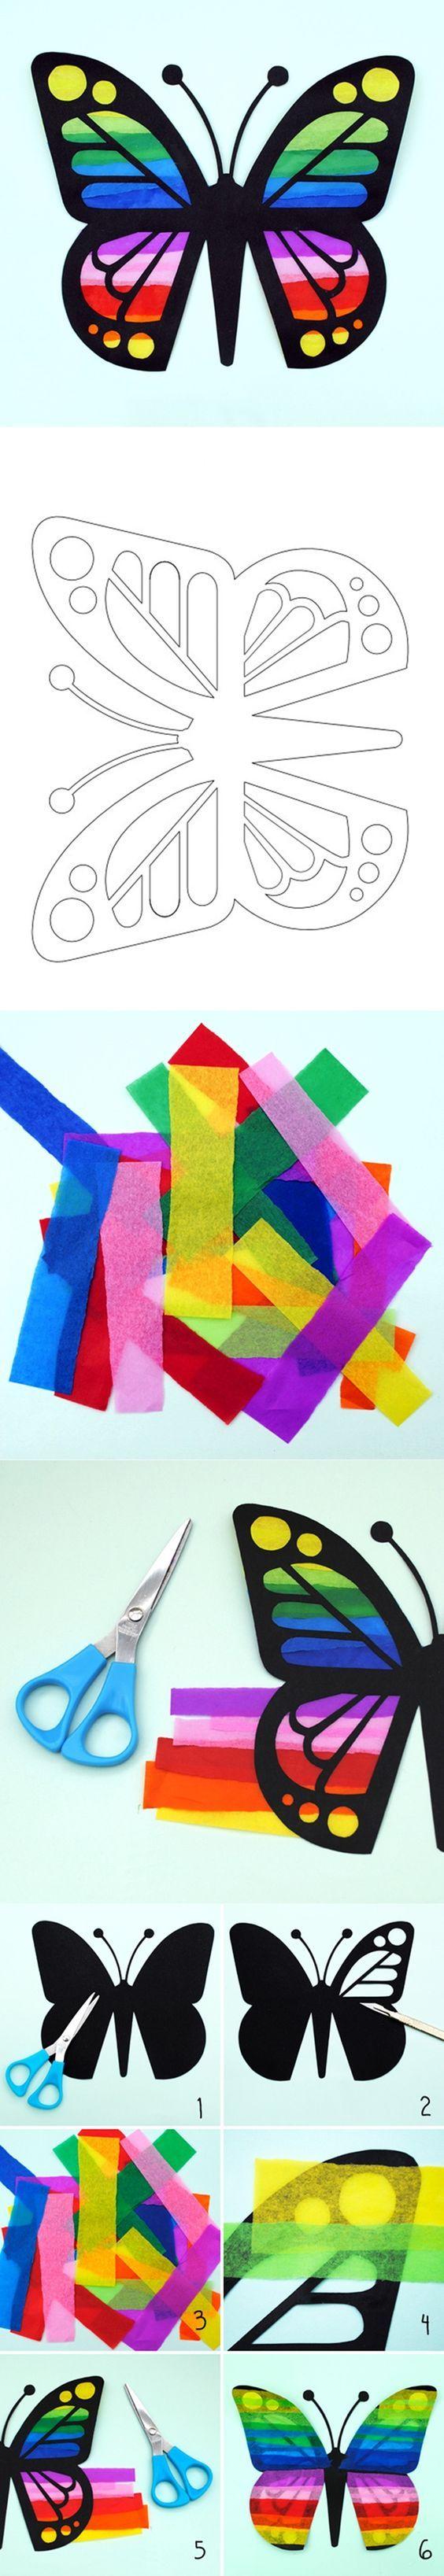 DIY Paper Butterfly Sun Catcher | www.FabArtDIY.com LIKE Us on Facebook ==> https://www.facebook.com/FabArtDIY: